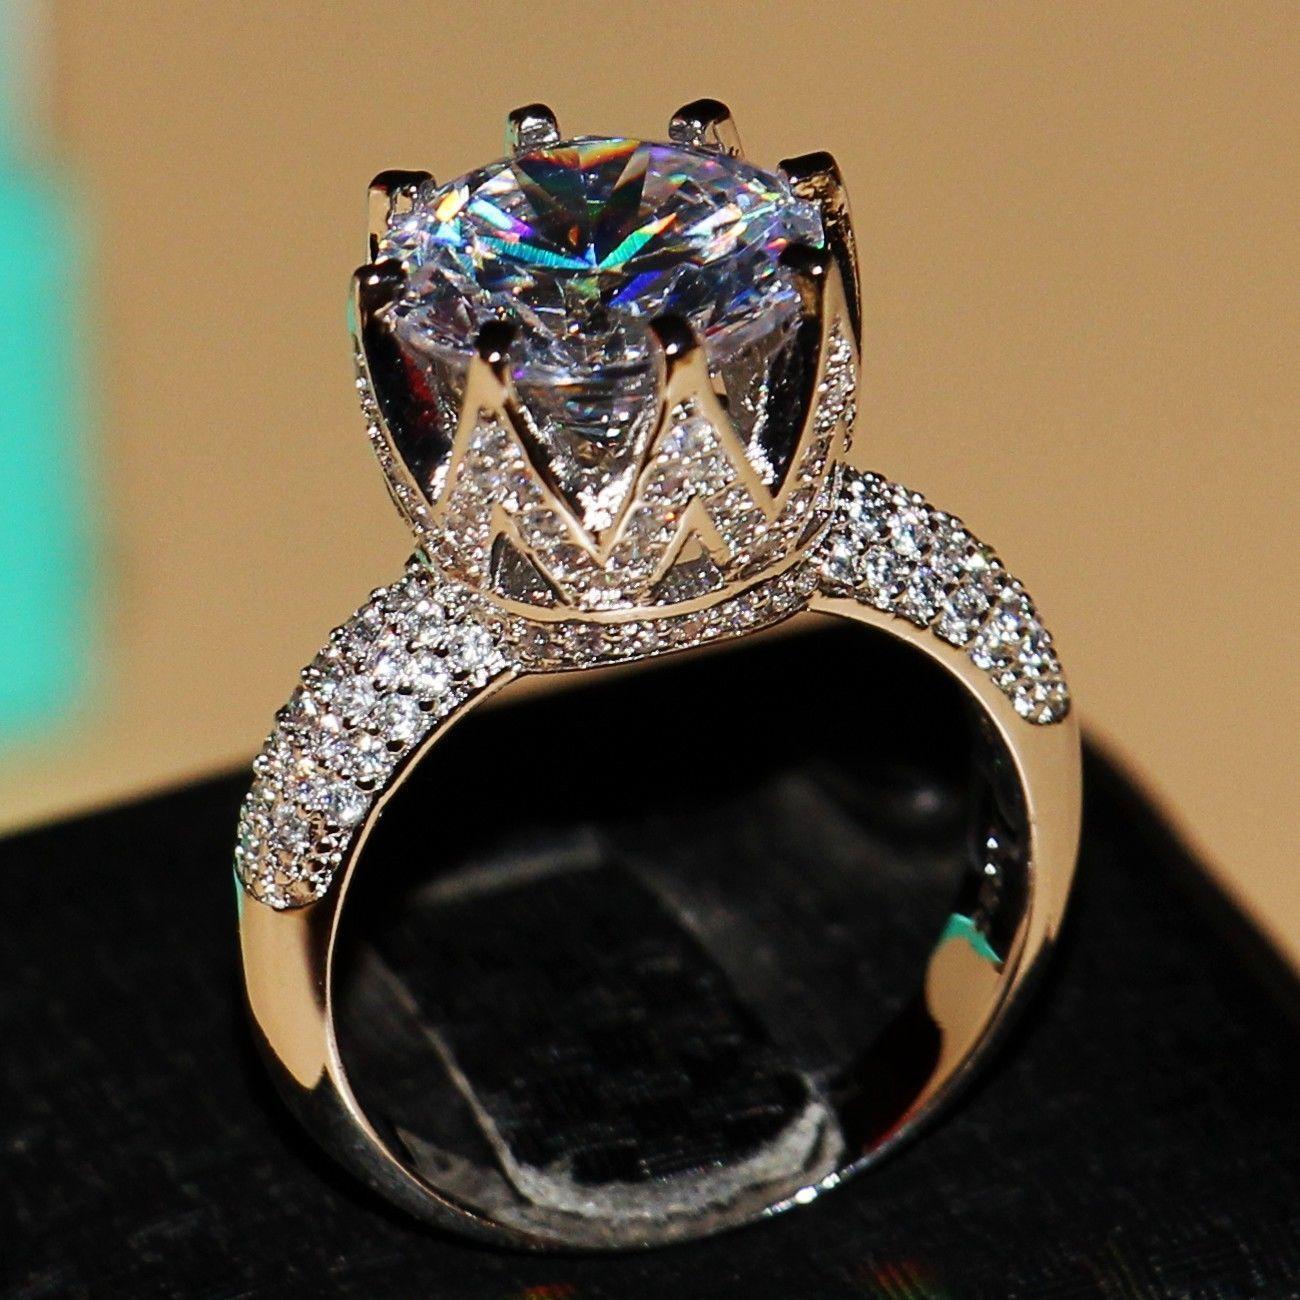 Nobles damas joyas reales 925 Sterling anillo de plata circonita compromiso boda.